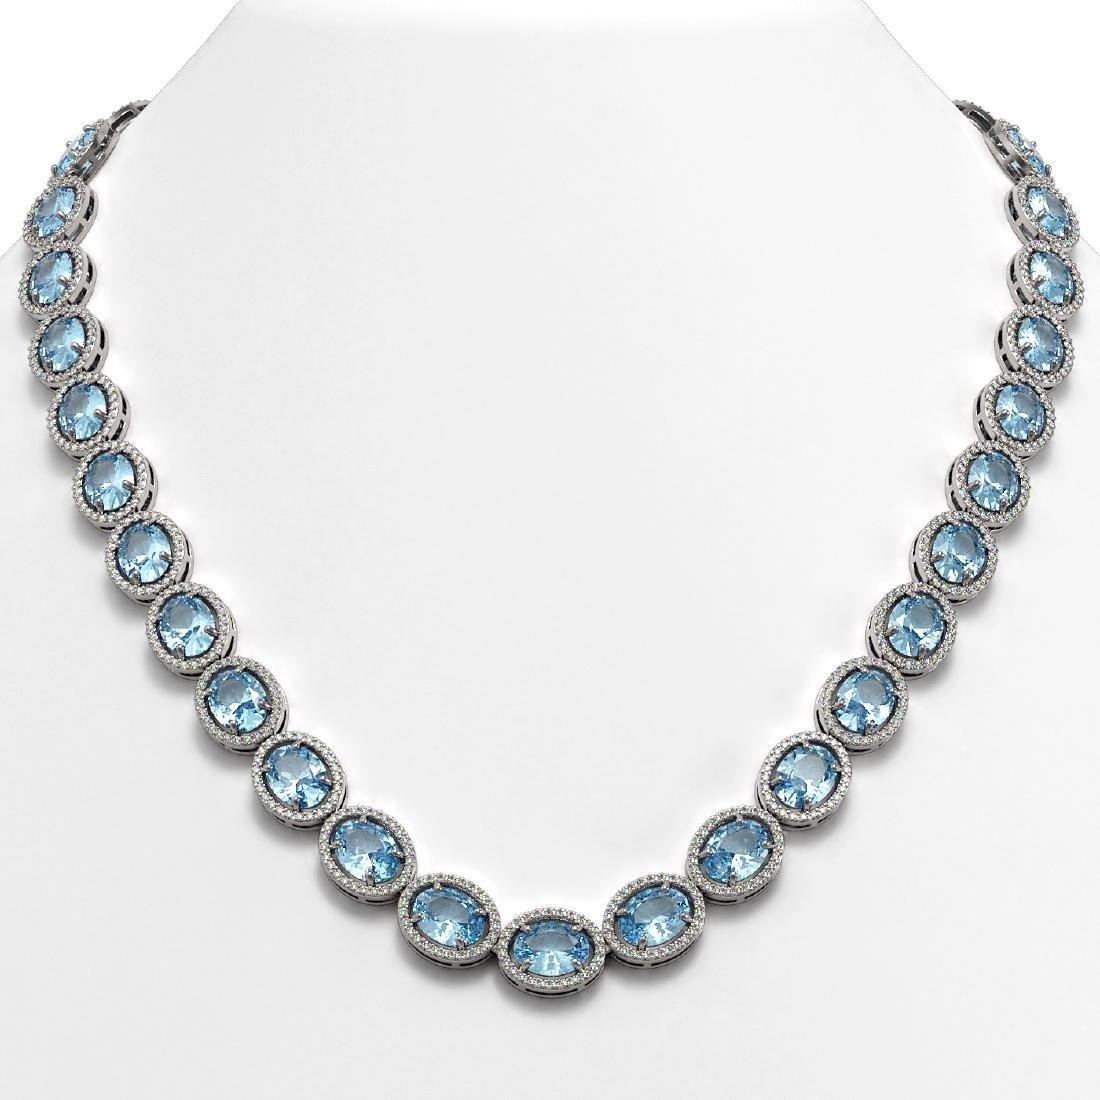 54.11 CTW Aquamarine & Diamond Halo Necklace 10K White